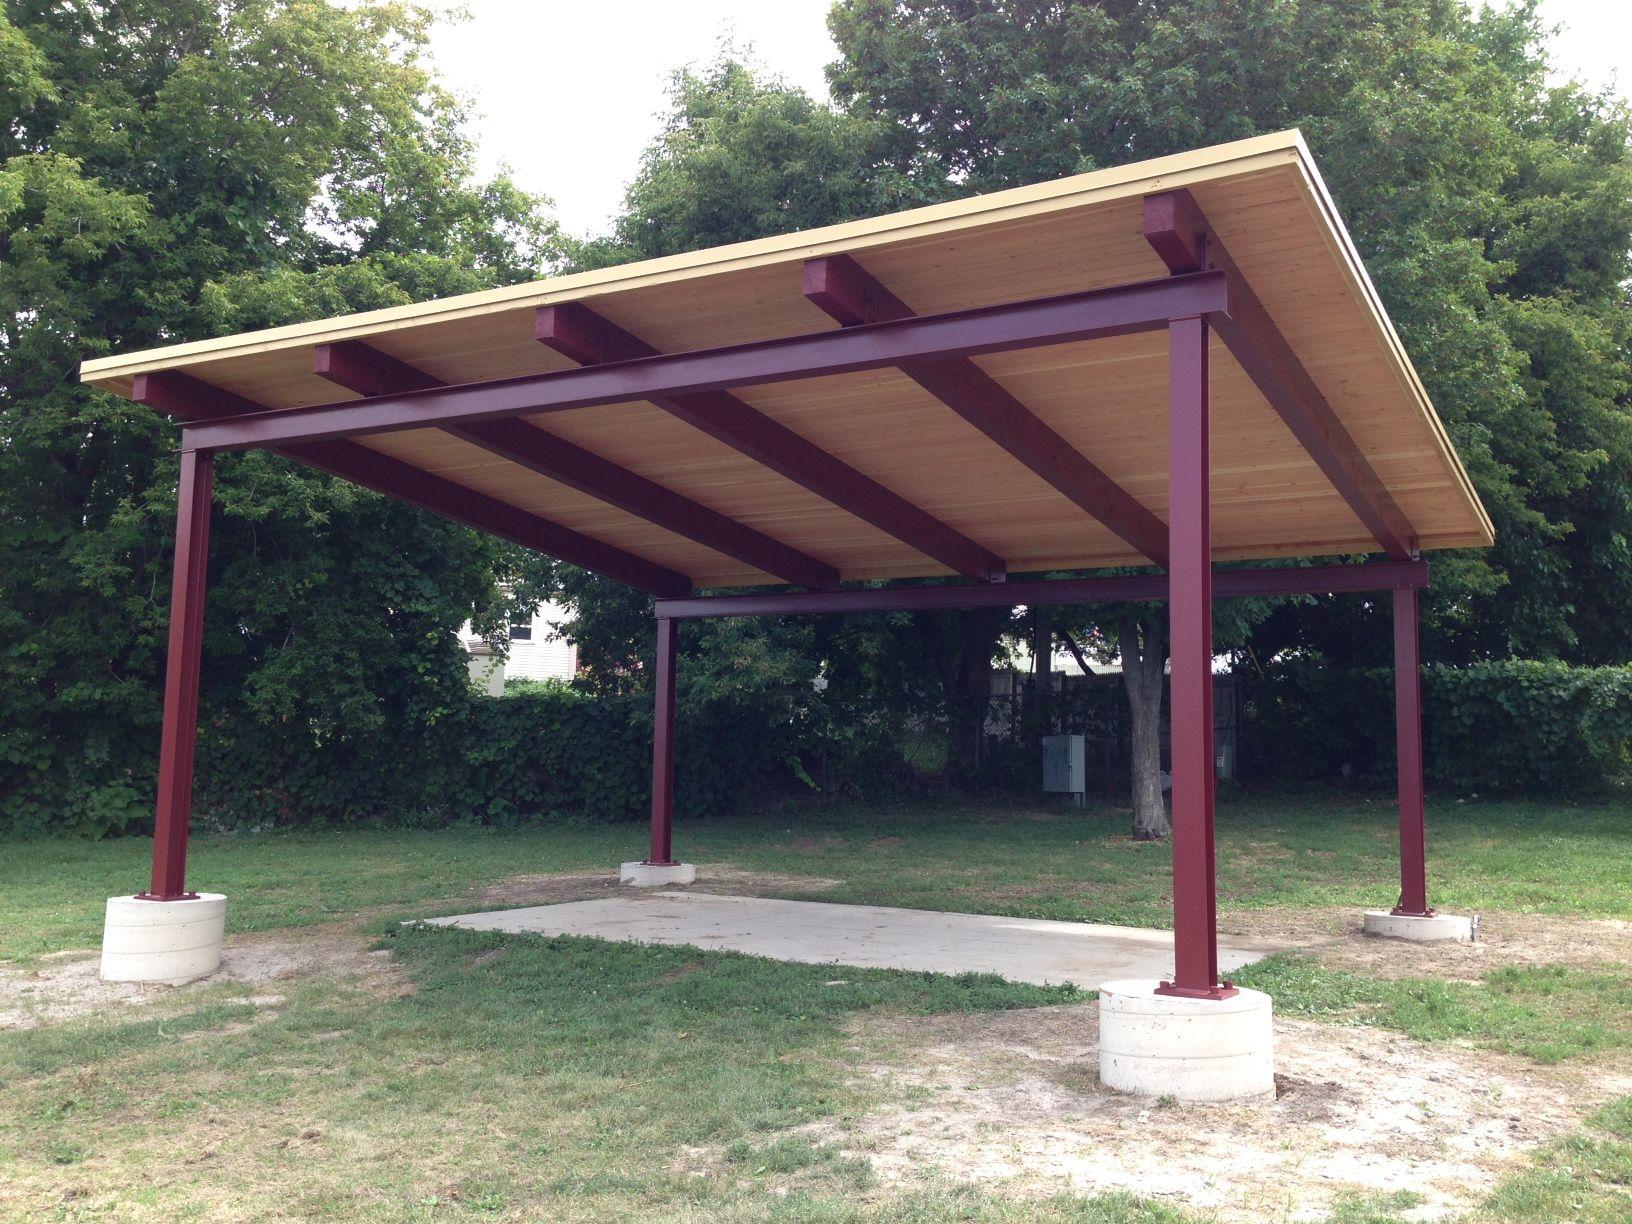 Pin By John Standerford On Outdoor Amphitheater Carport Designs Diy Carport Pergola Patio